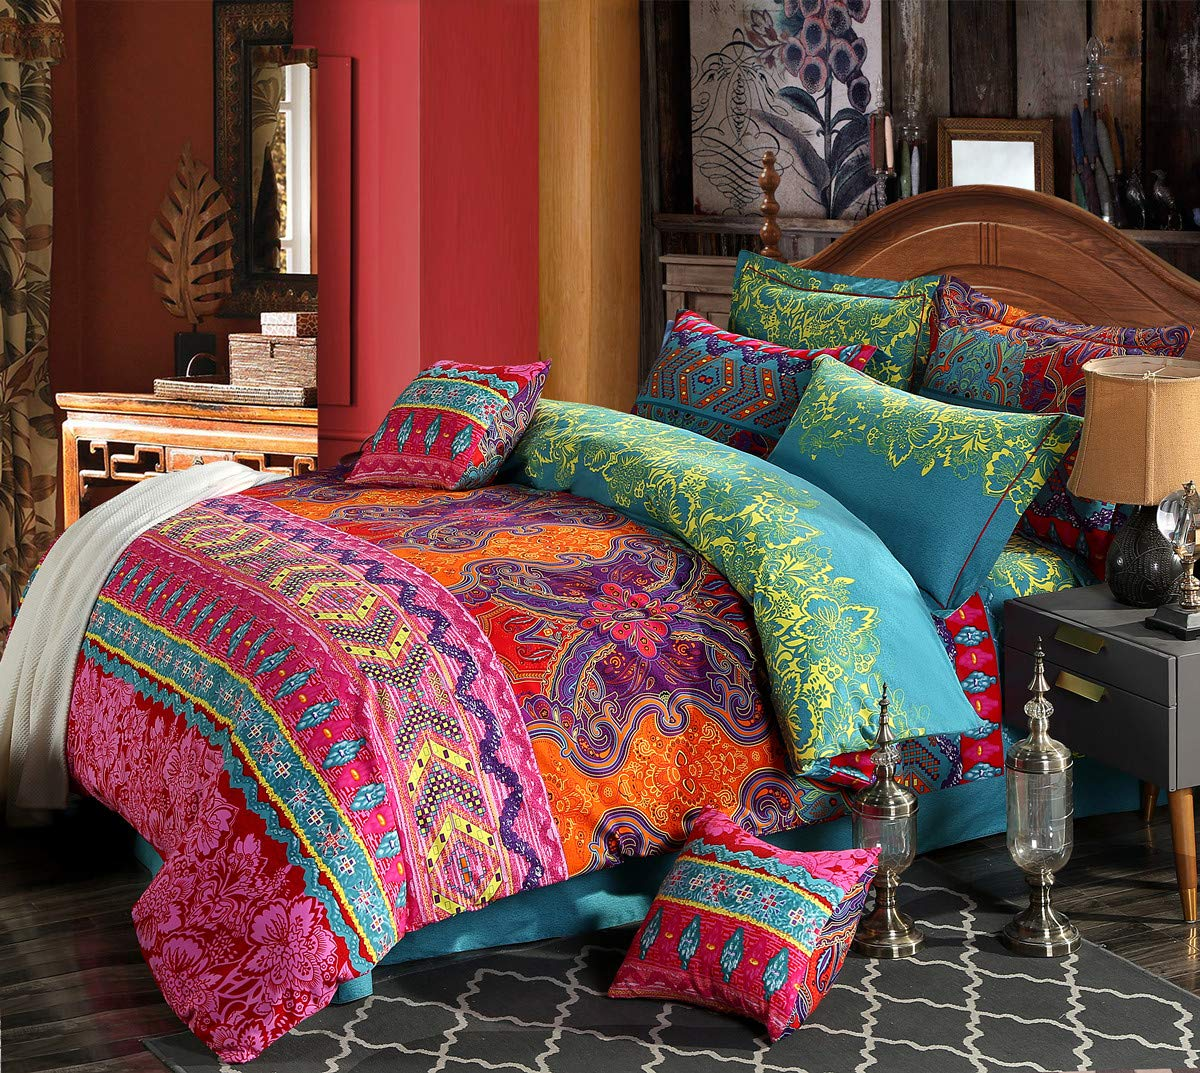 HNNSI 4 Pieces Bohemia Ethnic Bedding Sets King Size,Brushed Cotton Boho Duvet Cover Set with Flat Sheet, Super Comfy Comforter Cover Sets,No Comforter(Flat Sheet Set, King)